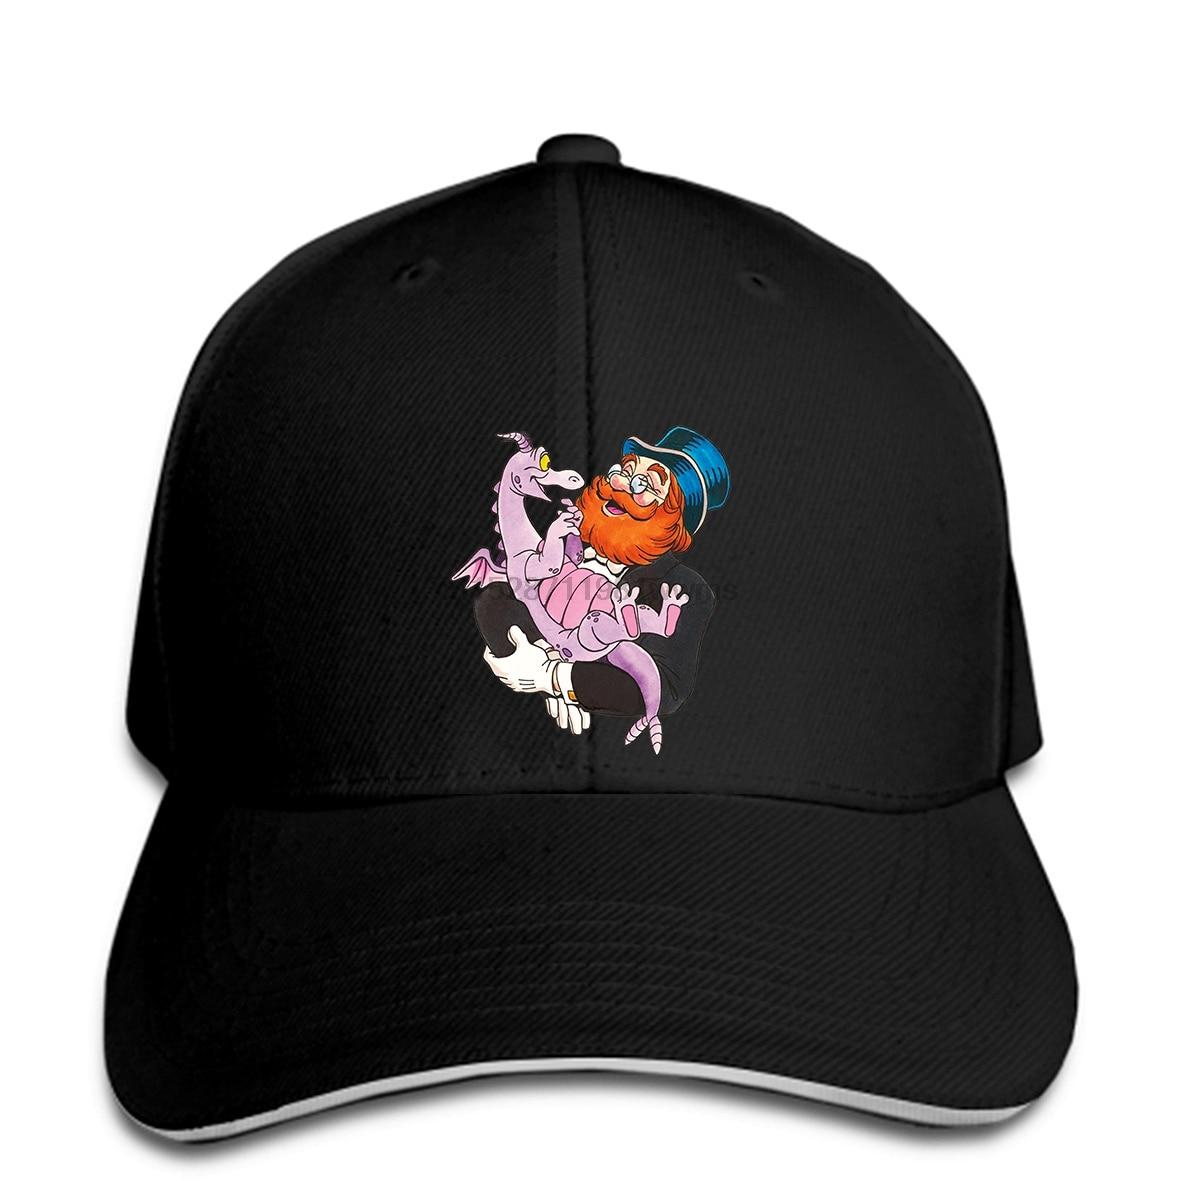 Dreamfinder and Figment Mens Baseball cap Fitness Hip Hop MenBaseball cap Super Big ZL snapback hat Peaked(China)